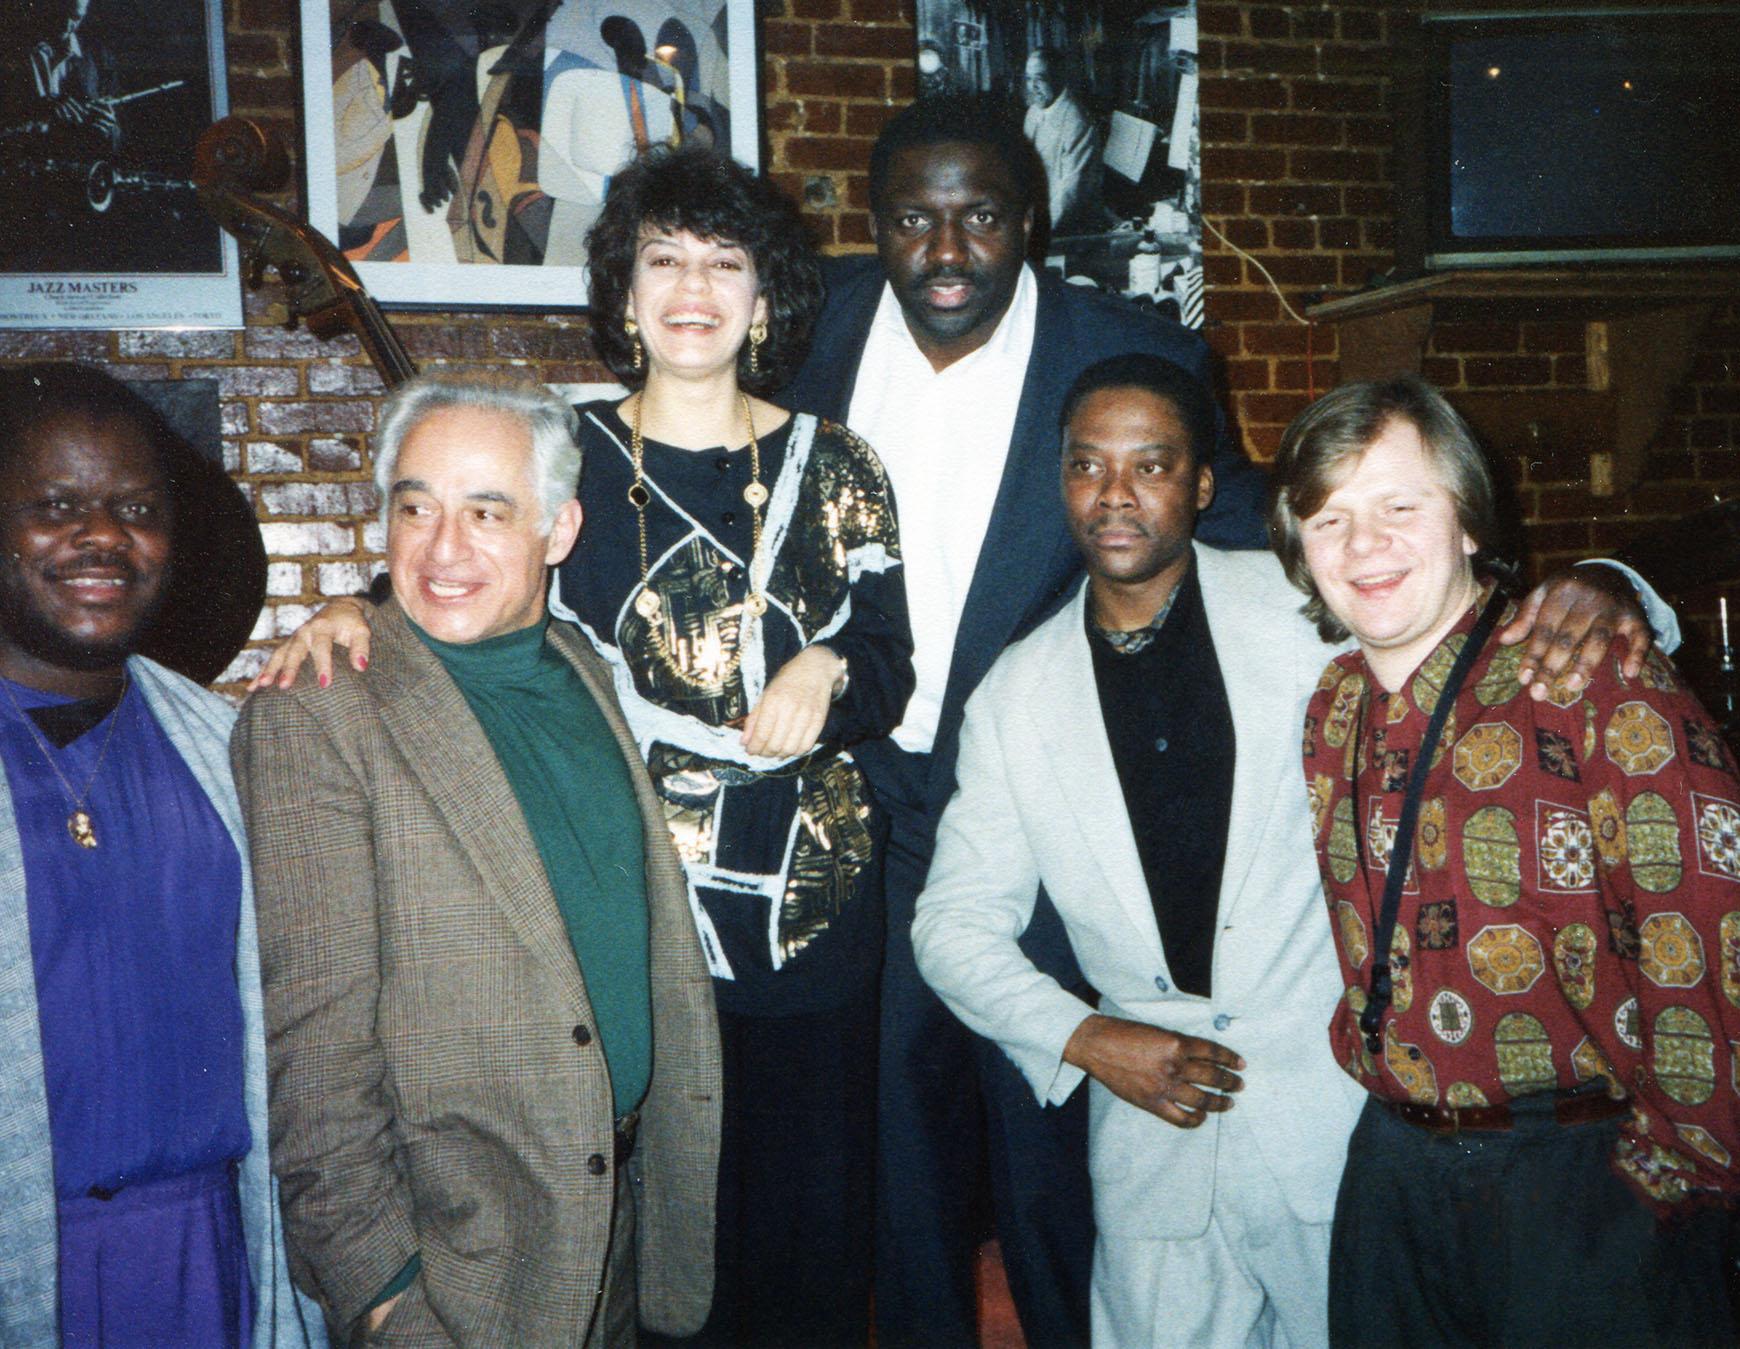 Group photo at Takota Tavern inWashington DC.